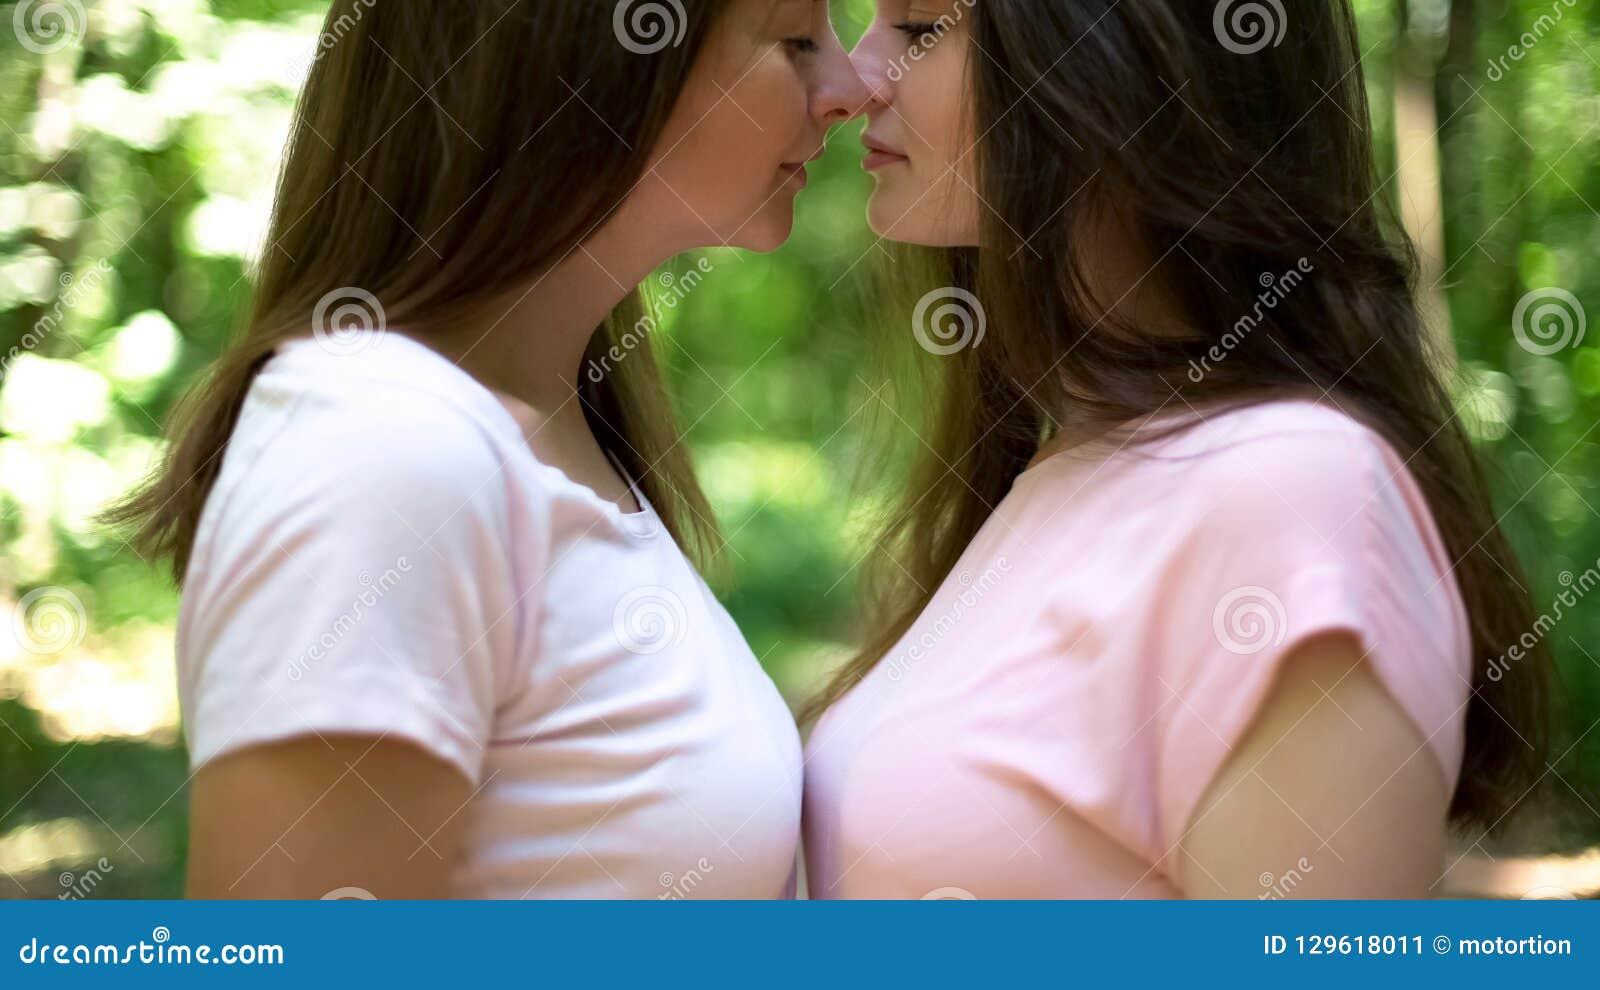 good girls being naughty sluts